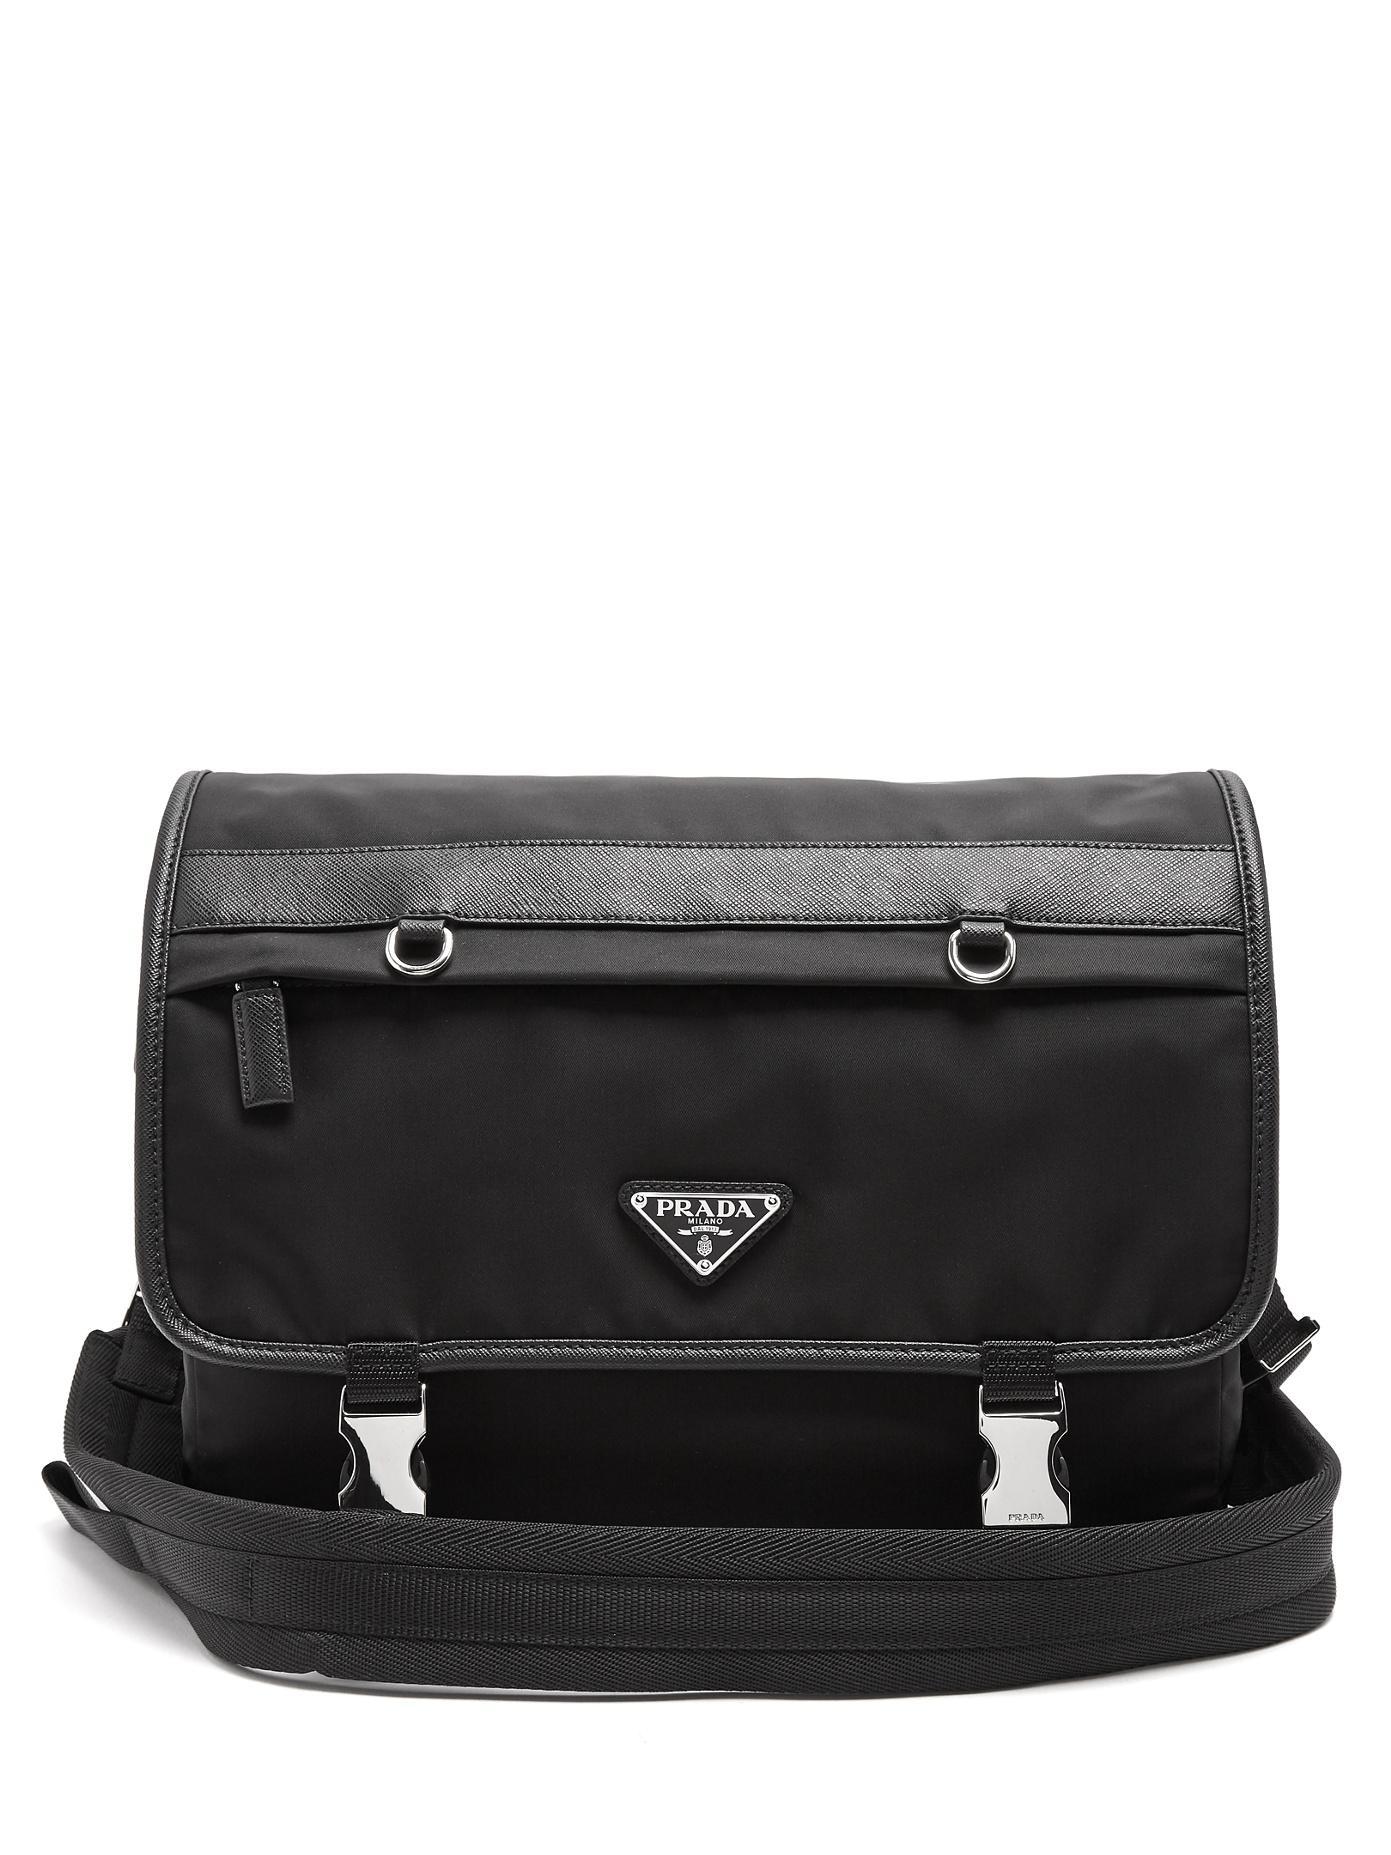 ... usa prada black leather trimmed nylon messenger bag for men lyst. view  fullscreen 69424 27abe 43dbc7a07f6e0